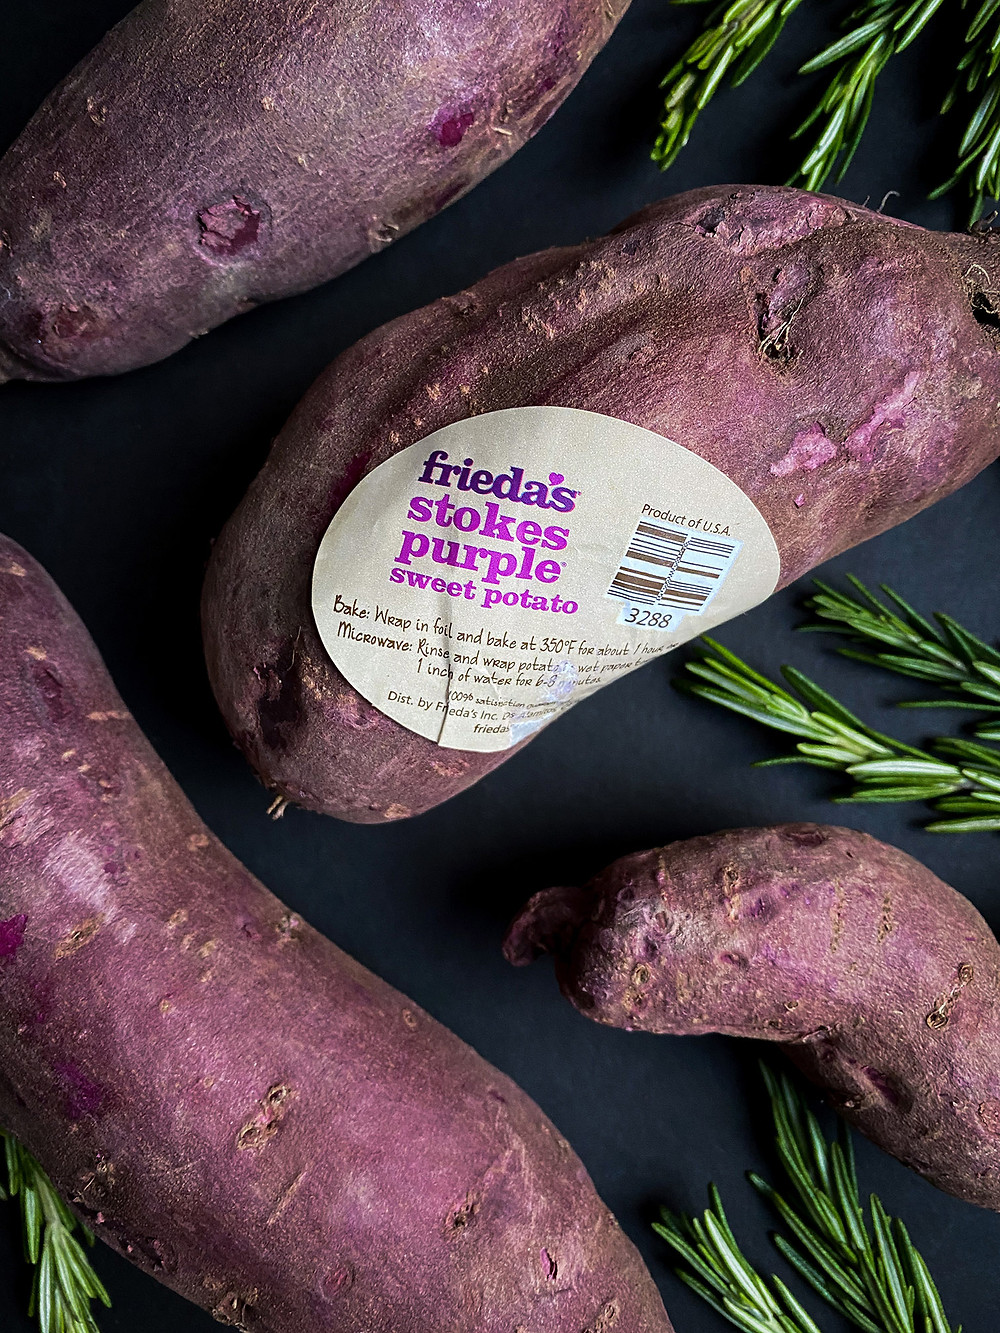 Frieda's Stokes Purple Sweet Potato